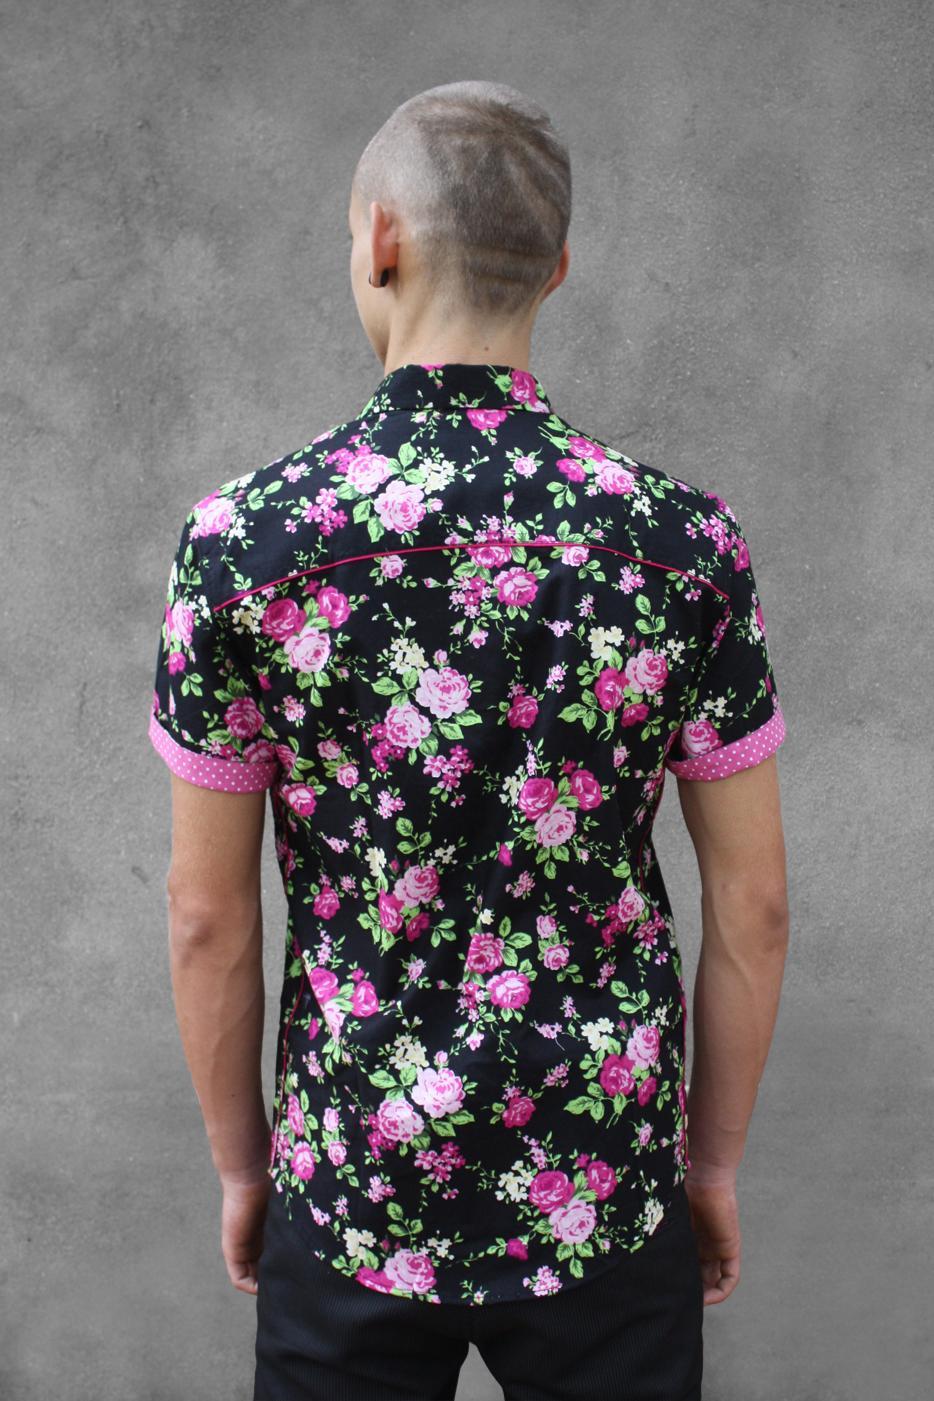 homme chemise chemise courte armani rose manche homme giorgio qgzwIrz5 eeb4fb73912